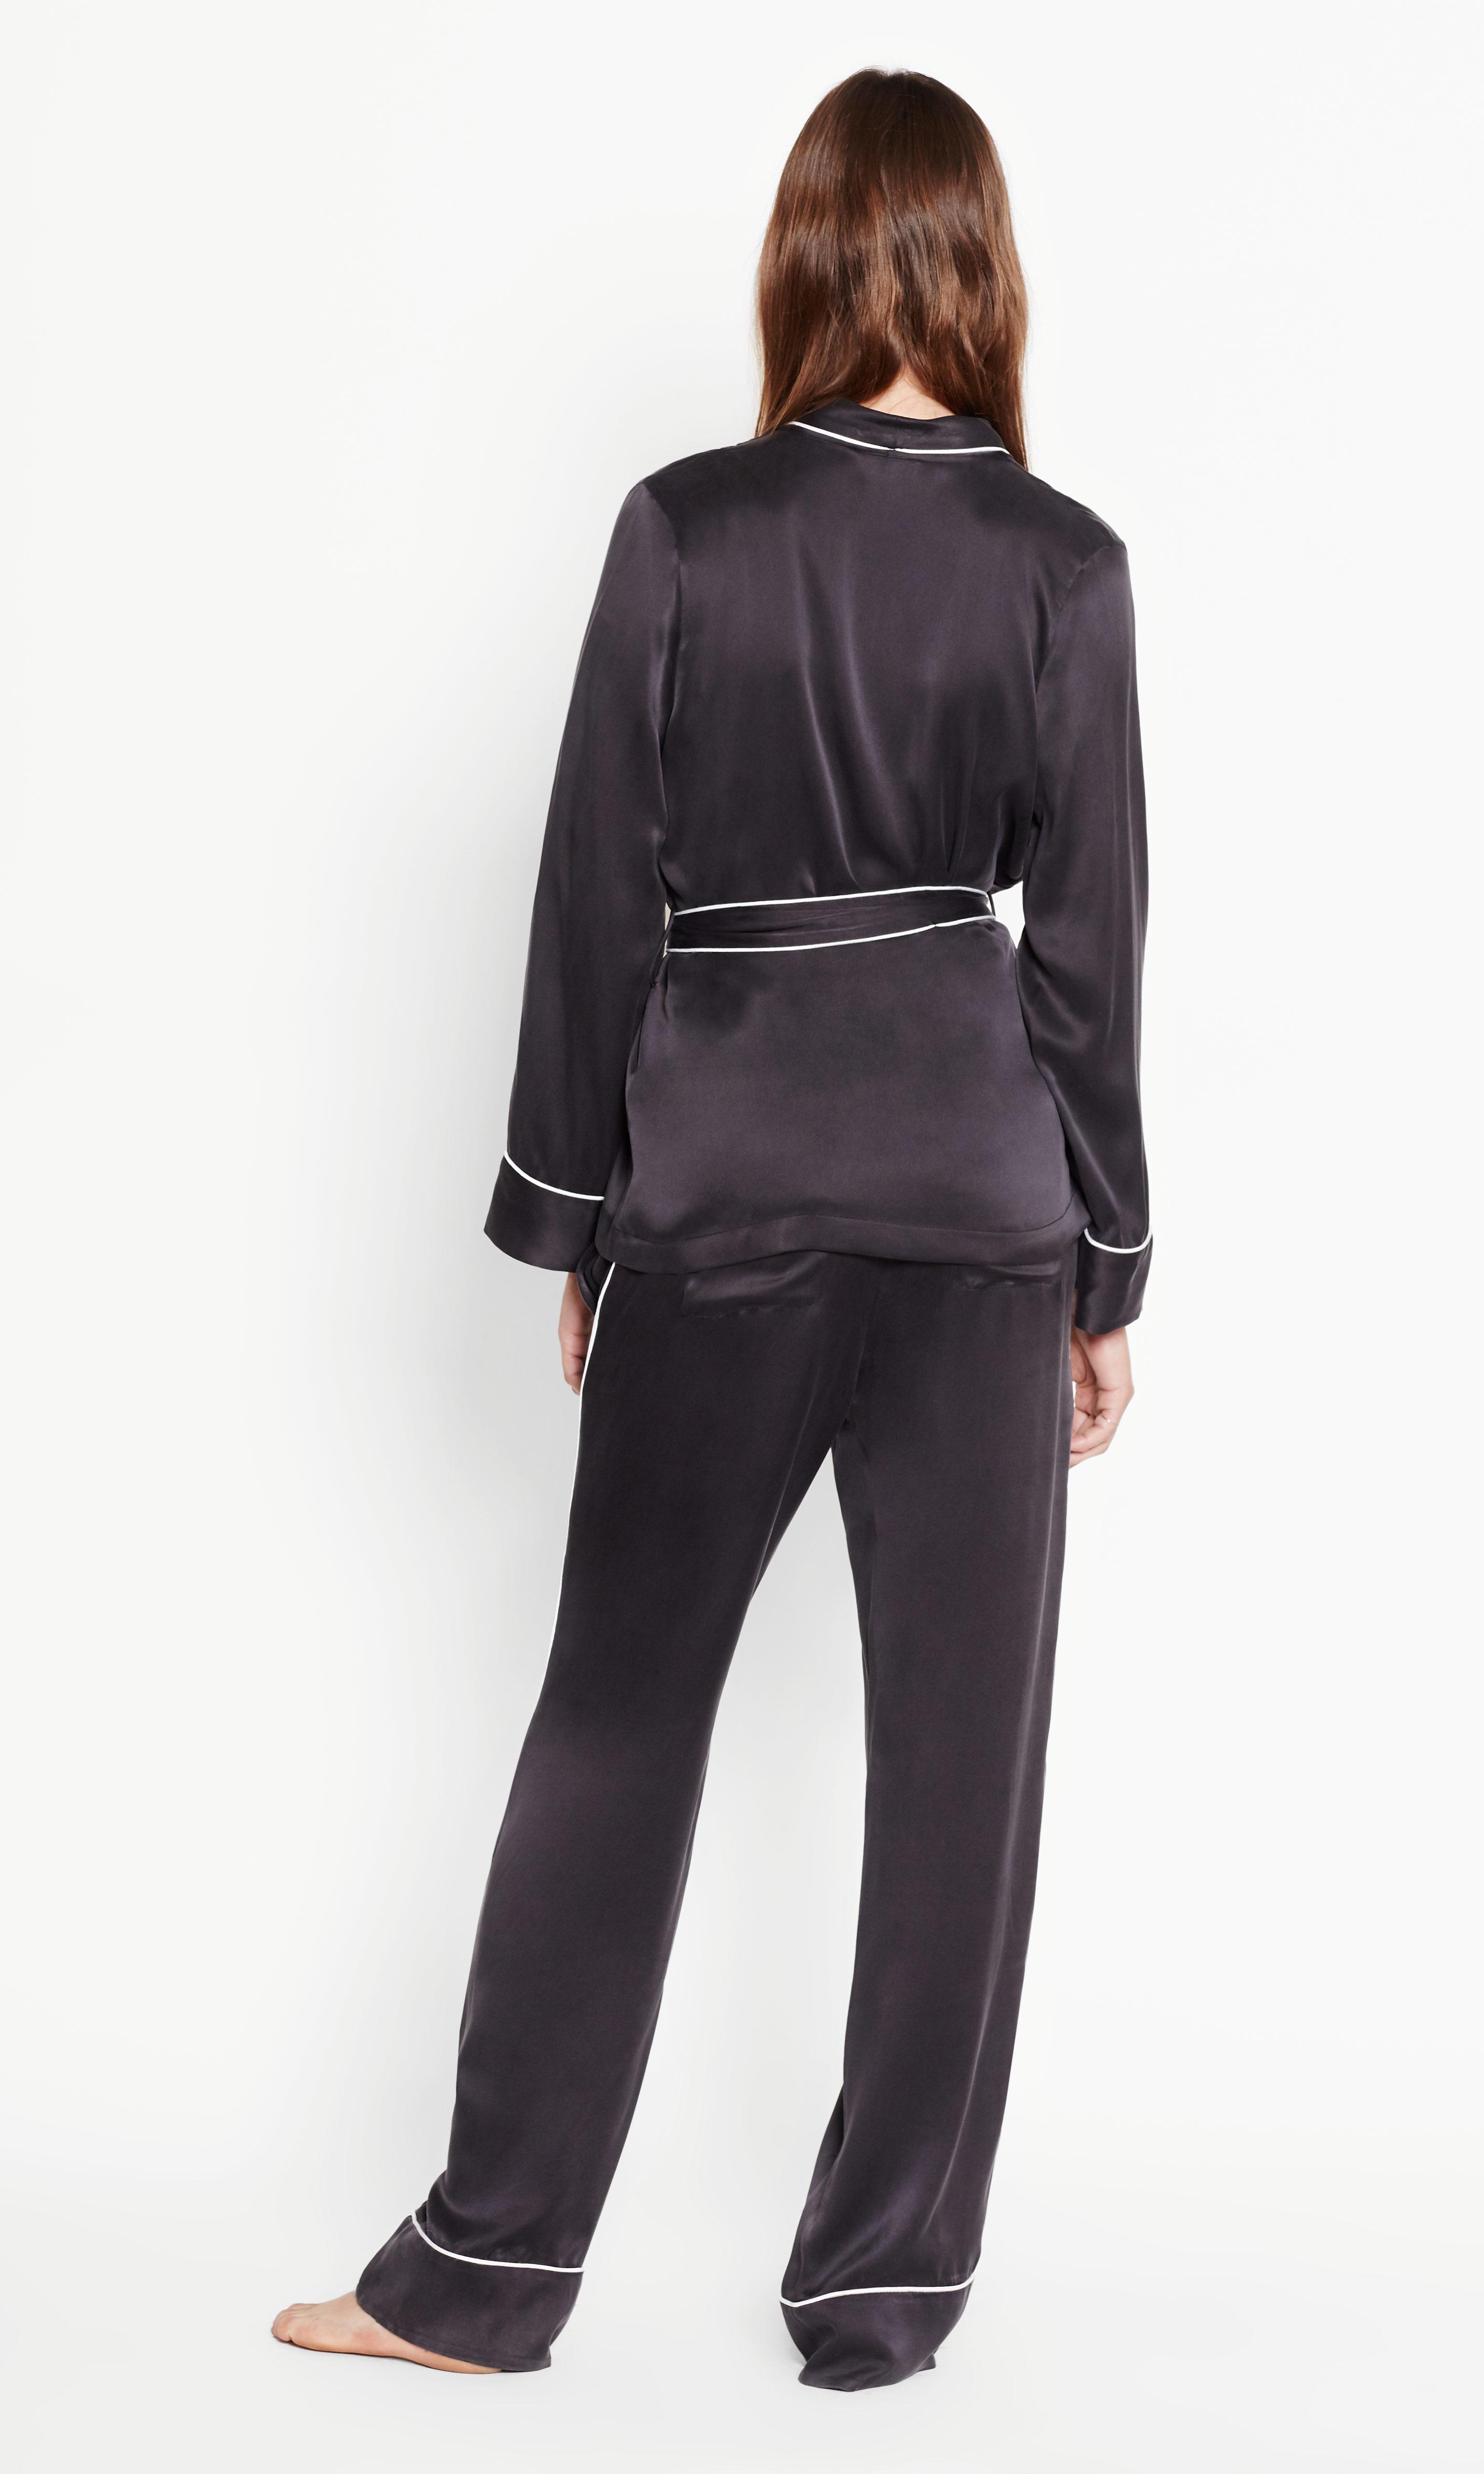 6b62ad5812 Lyst - Equipment Odette Satin Pajama Set in Black